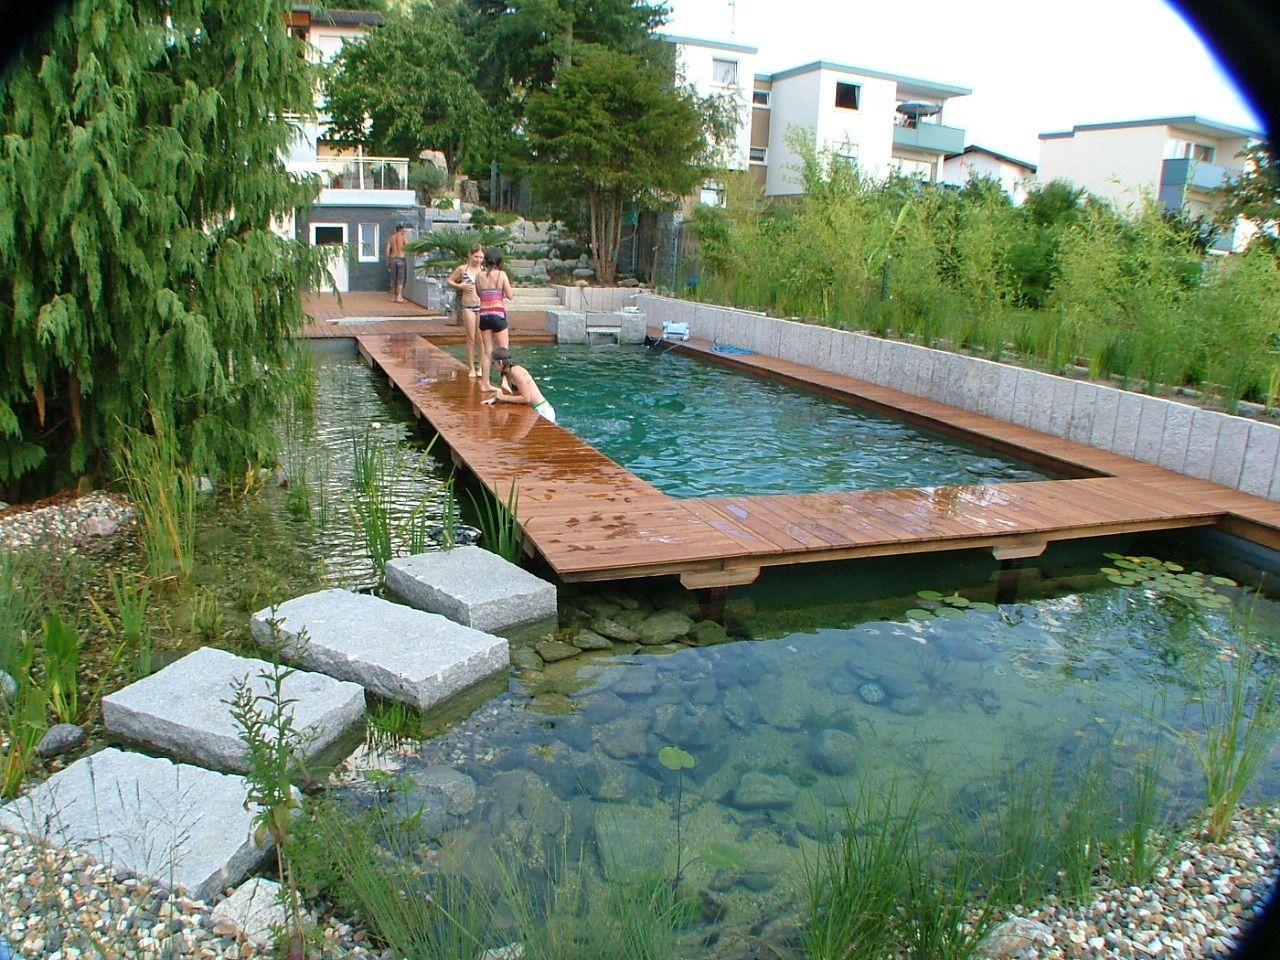 bionova natural swimming pool in germany | bionova natural pools in